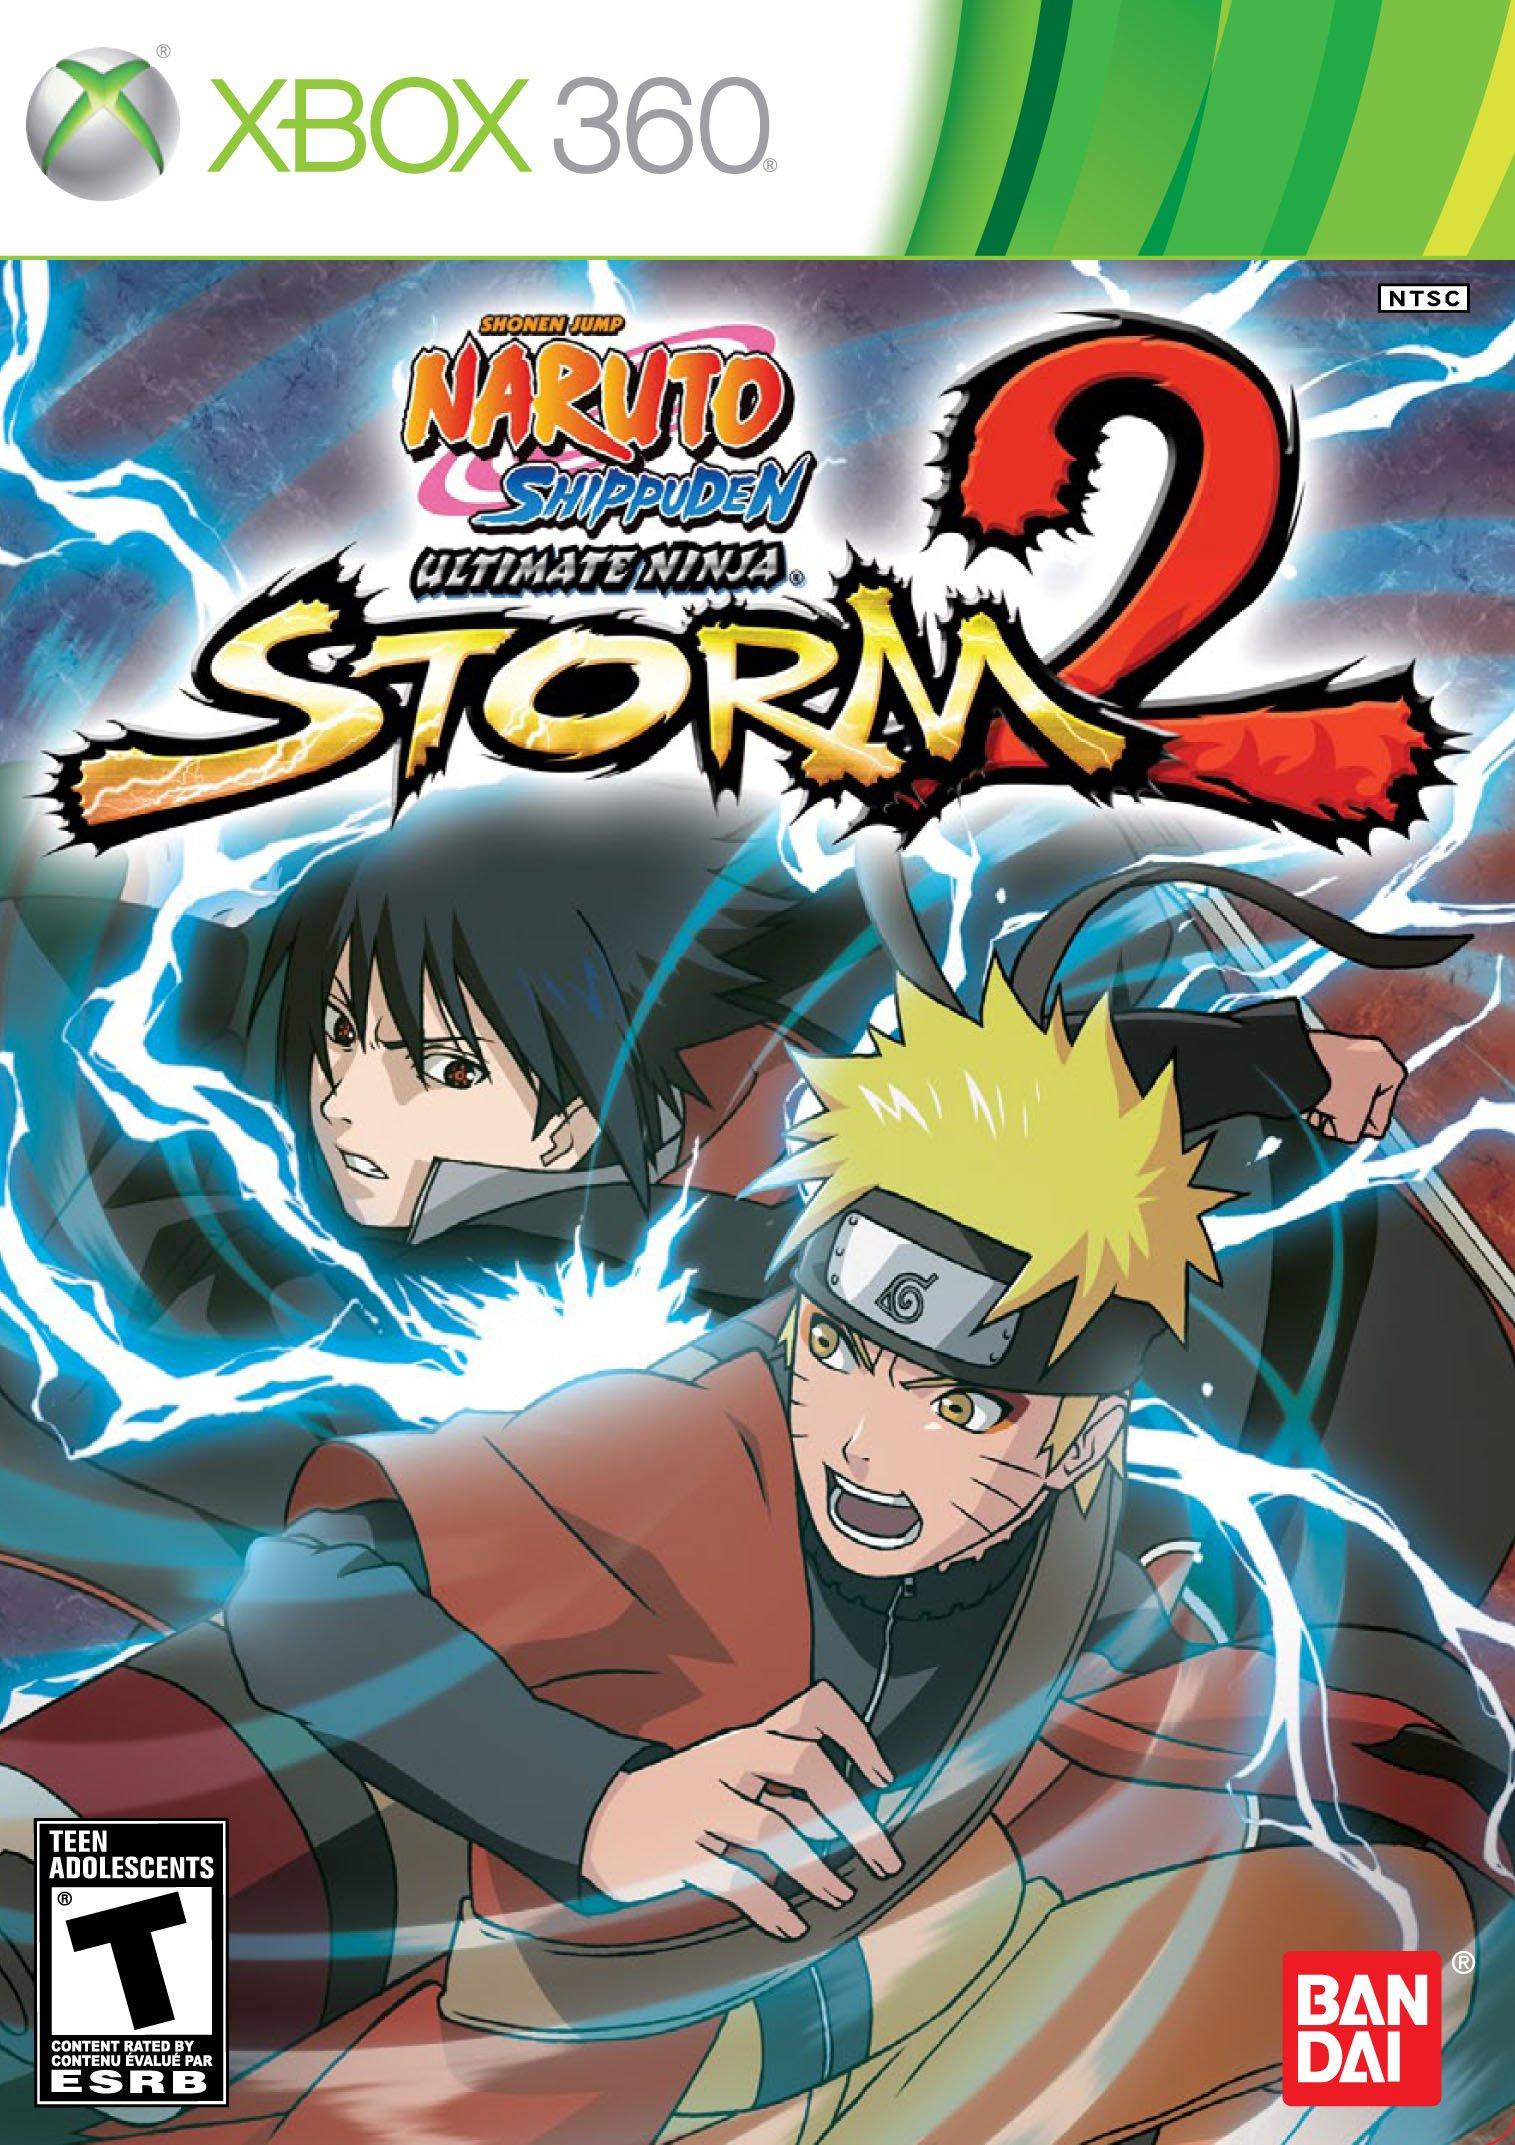 Ninja storm 4 release date in Perth